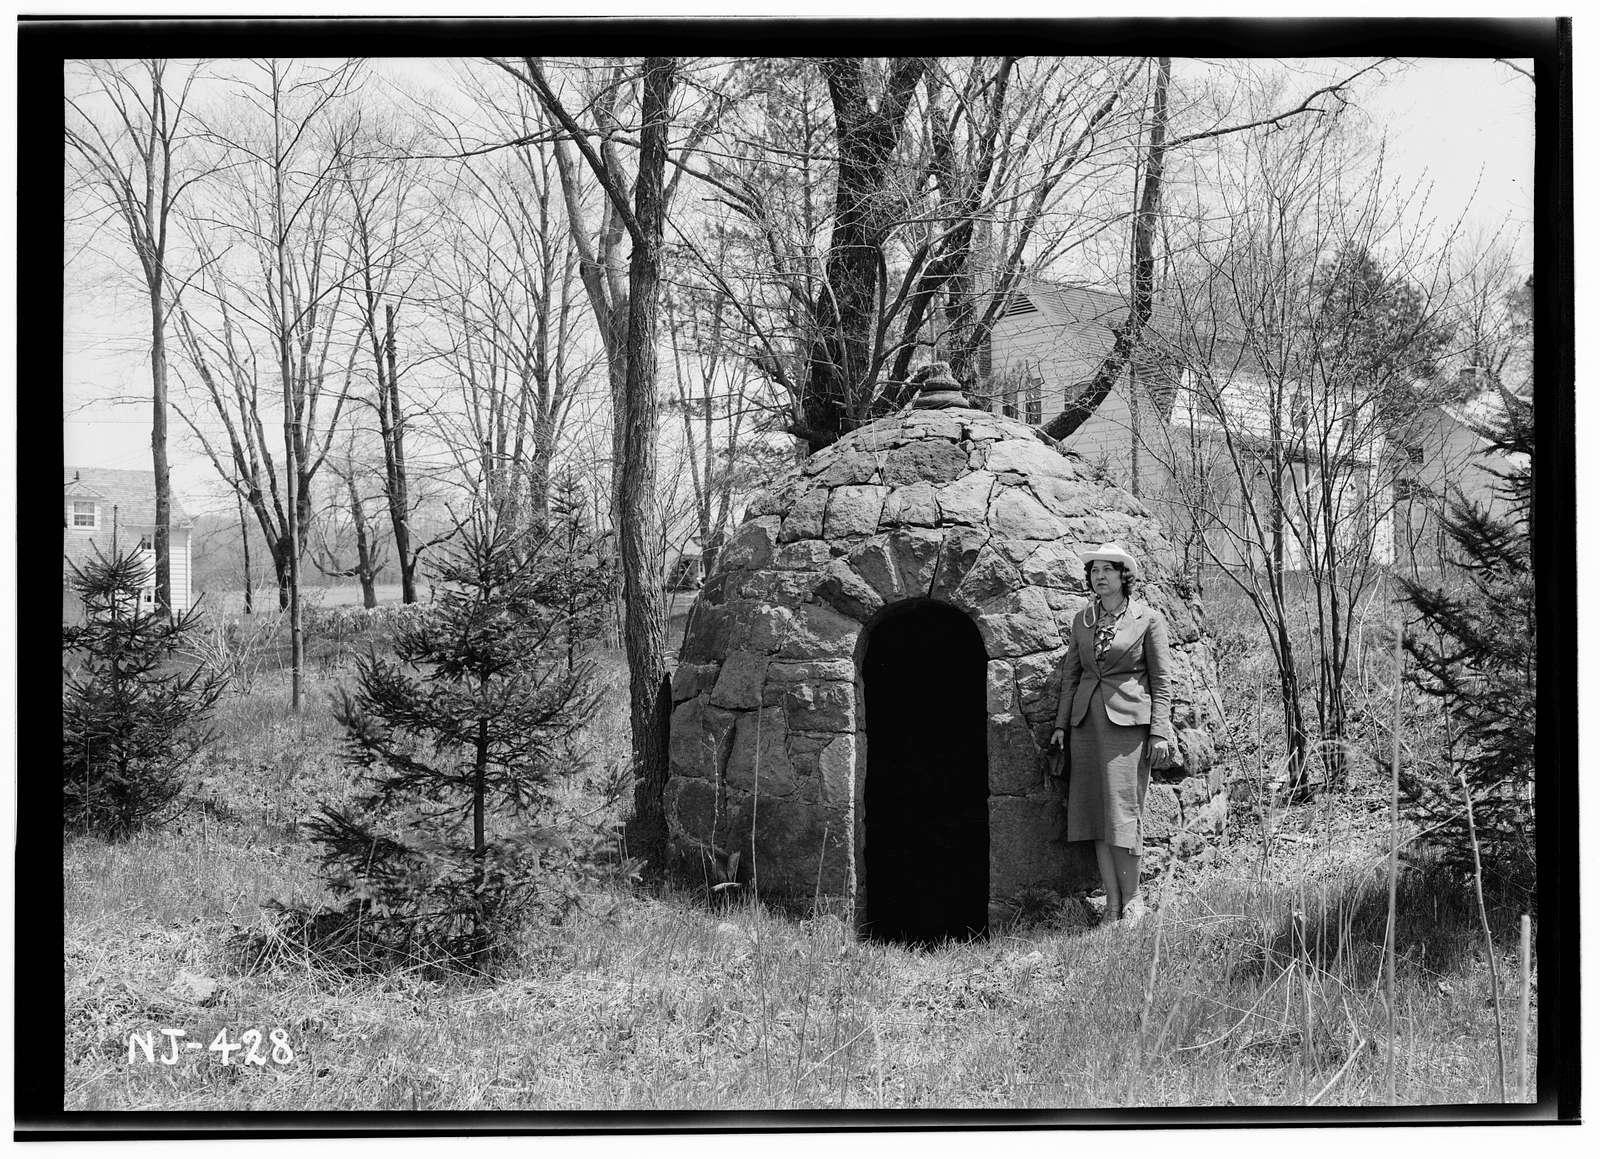 Matthew P. Bogert Stone Well House, Orchard Road, Demarest, Bergen County, NJ